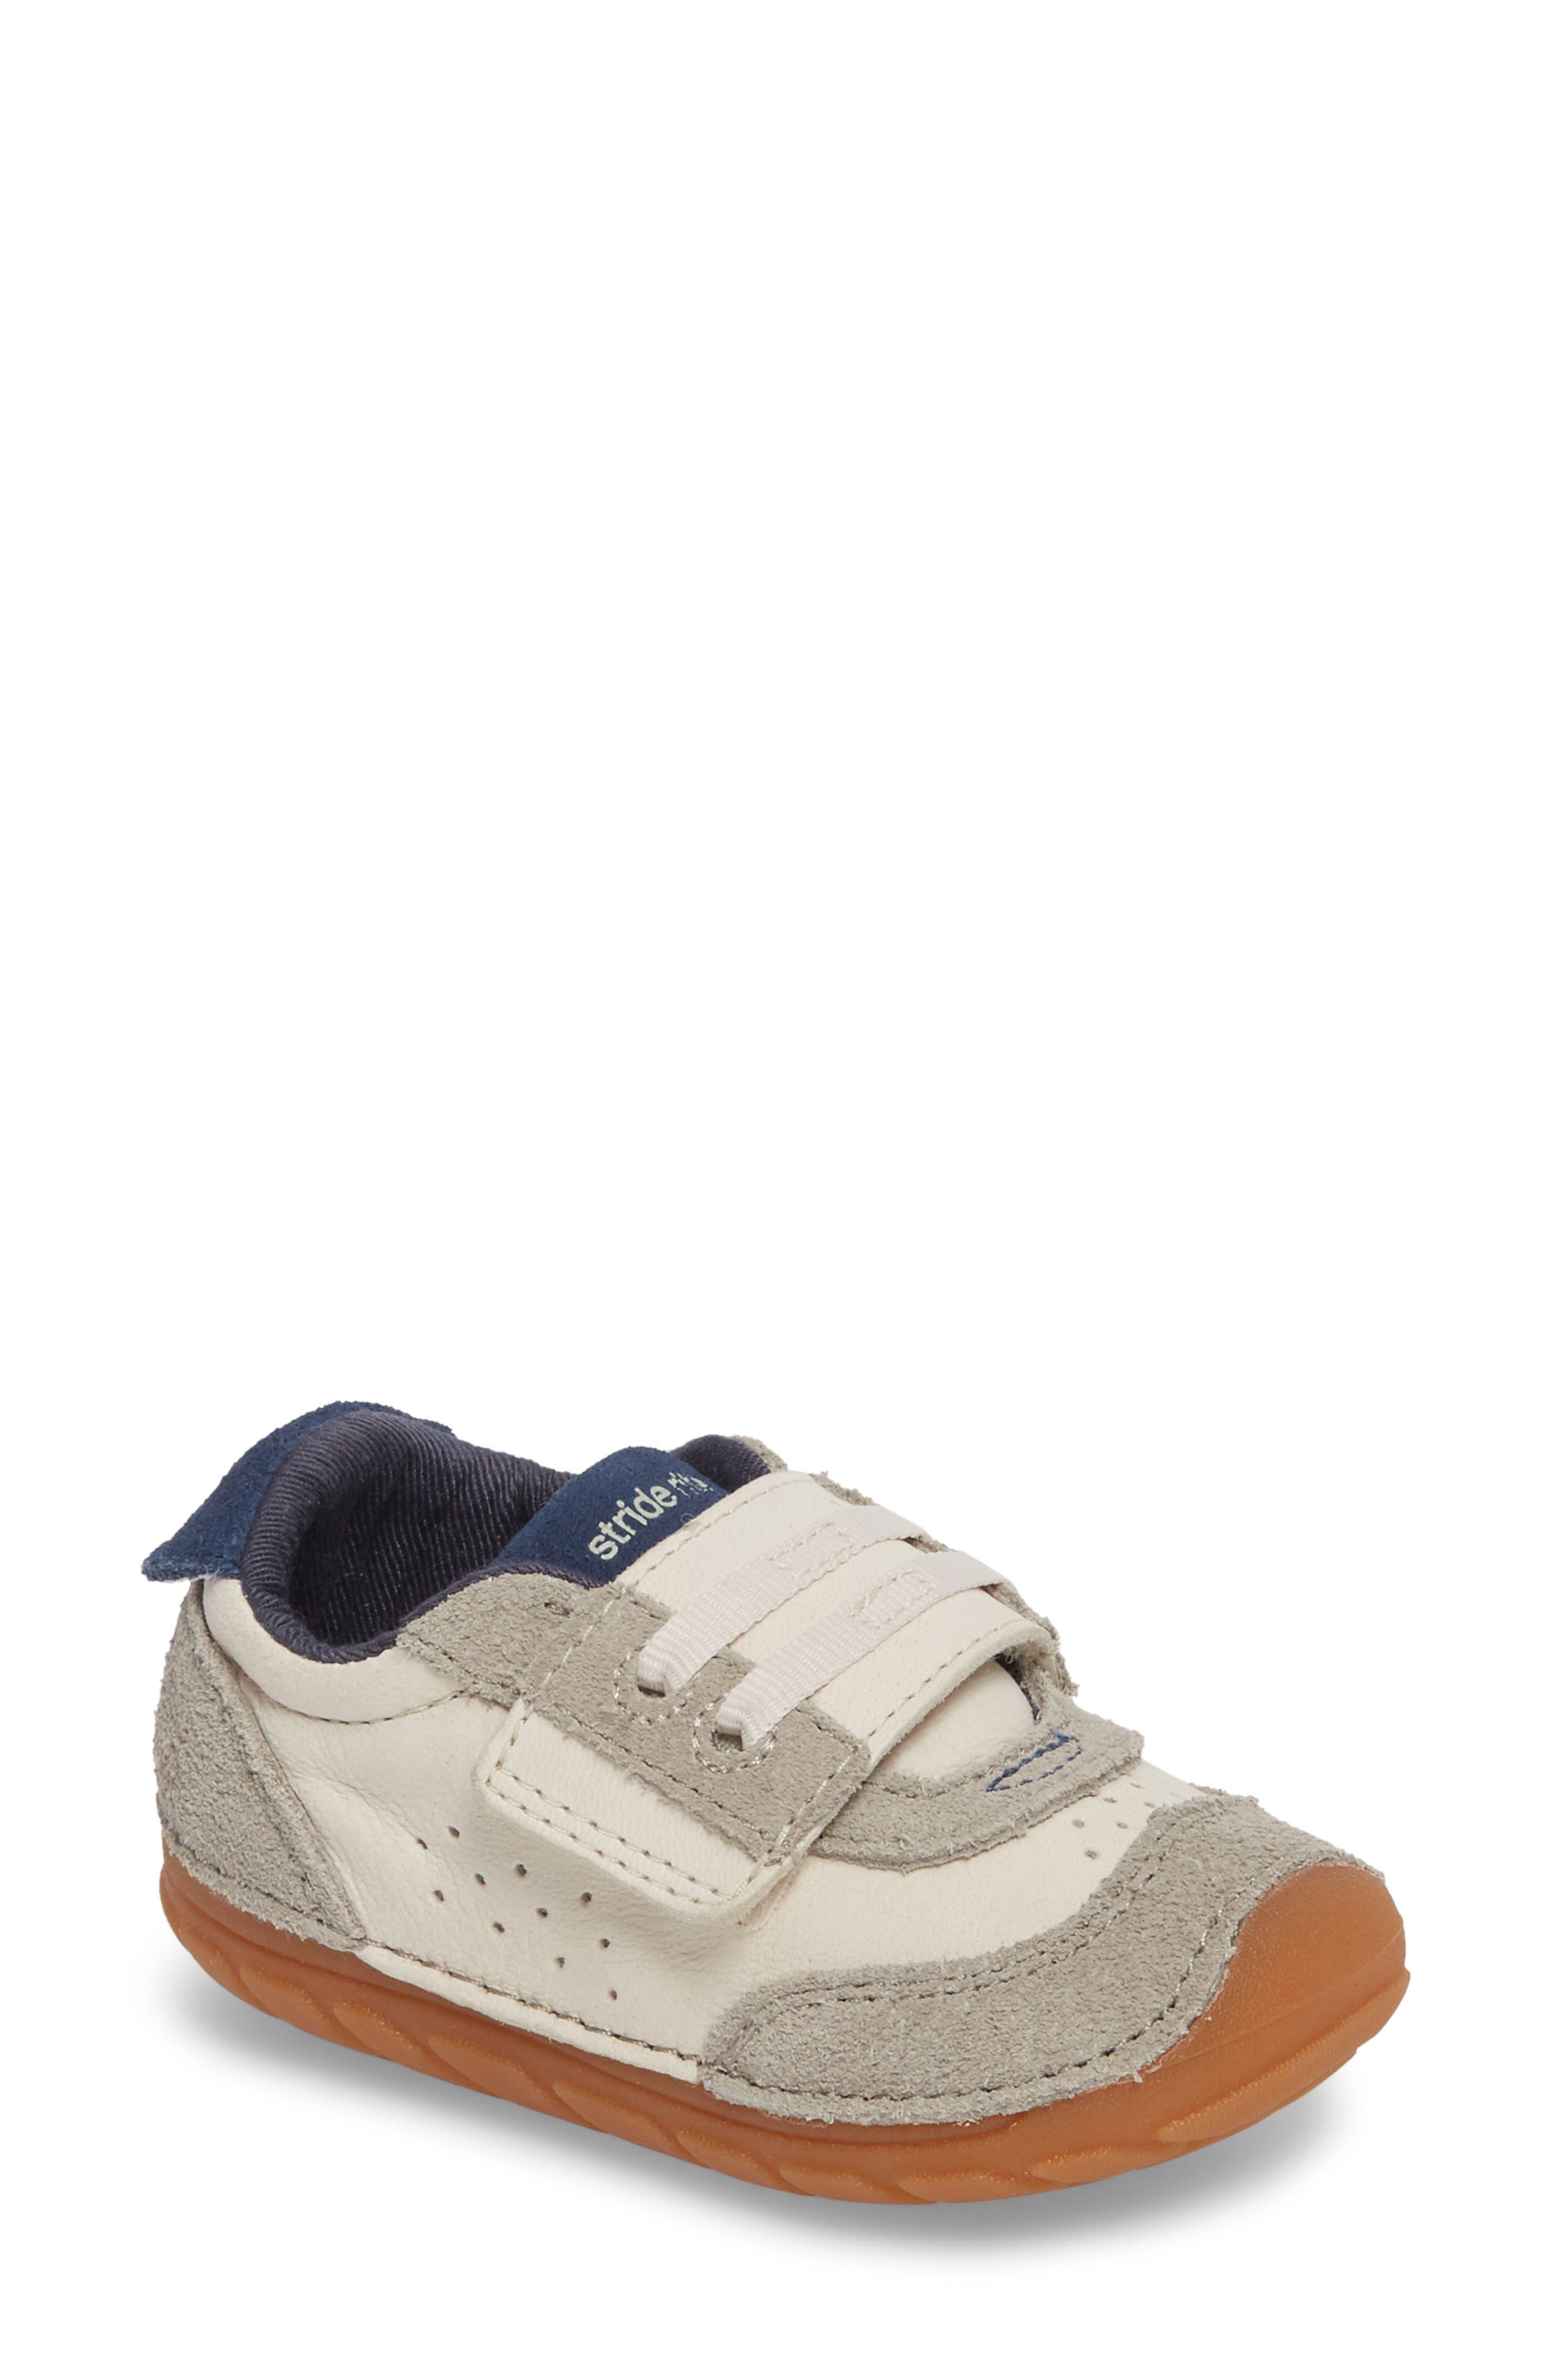 Stride Rite Soft Motion SRT Wyatt Sneaker (Baby & Walker)